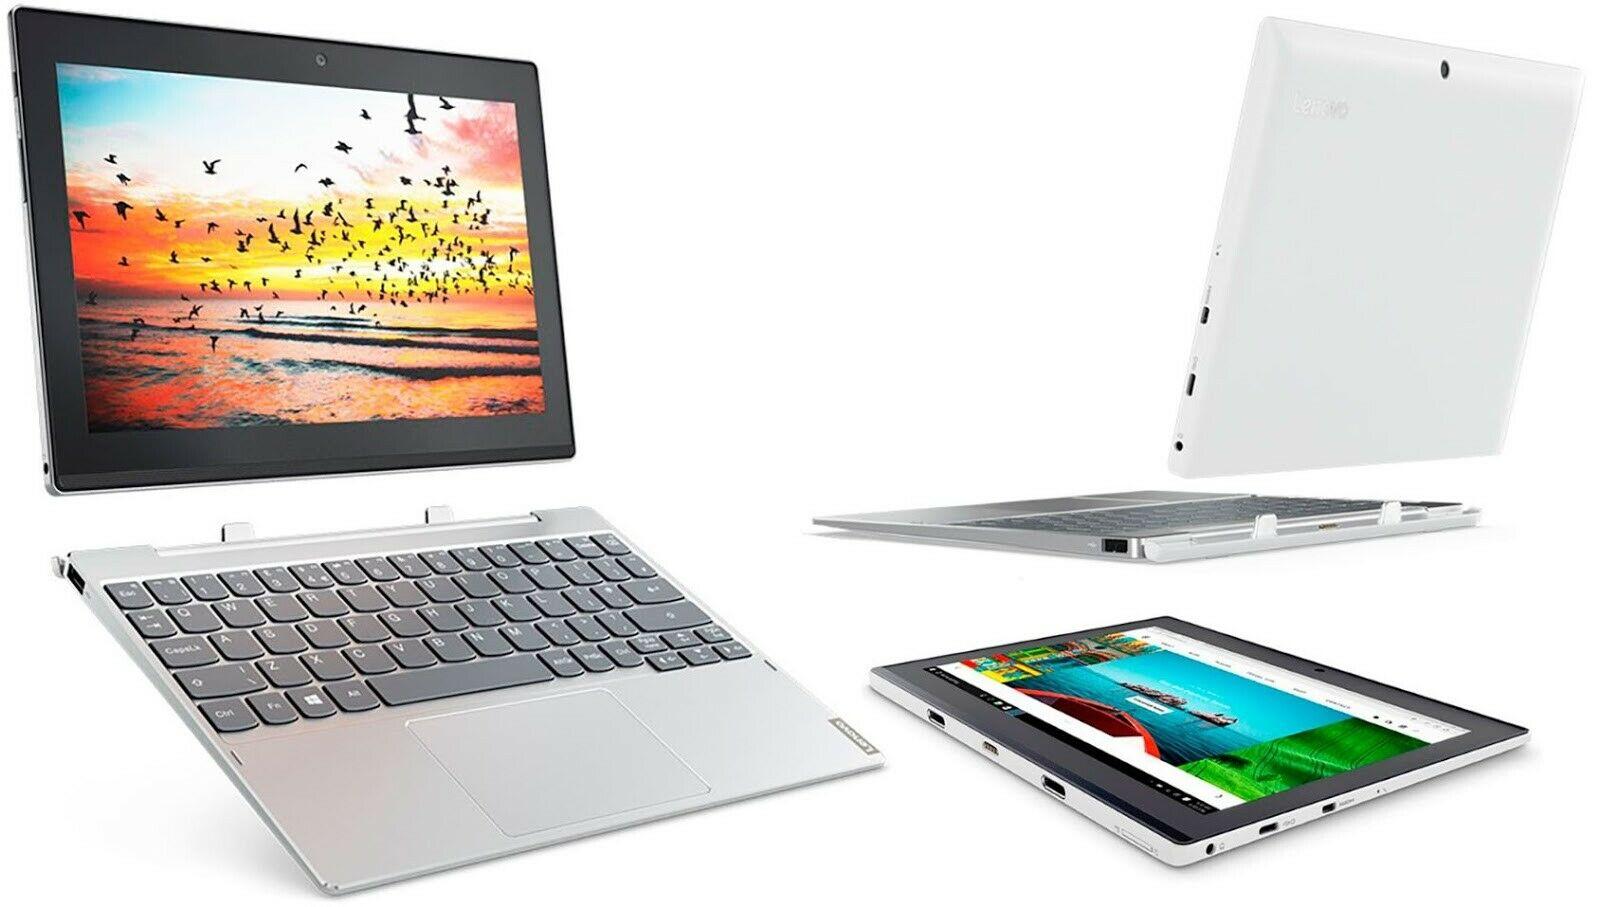 LENOVO MIIX 320 10 2GB 64GB WI-FI